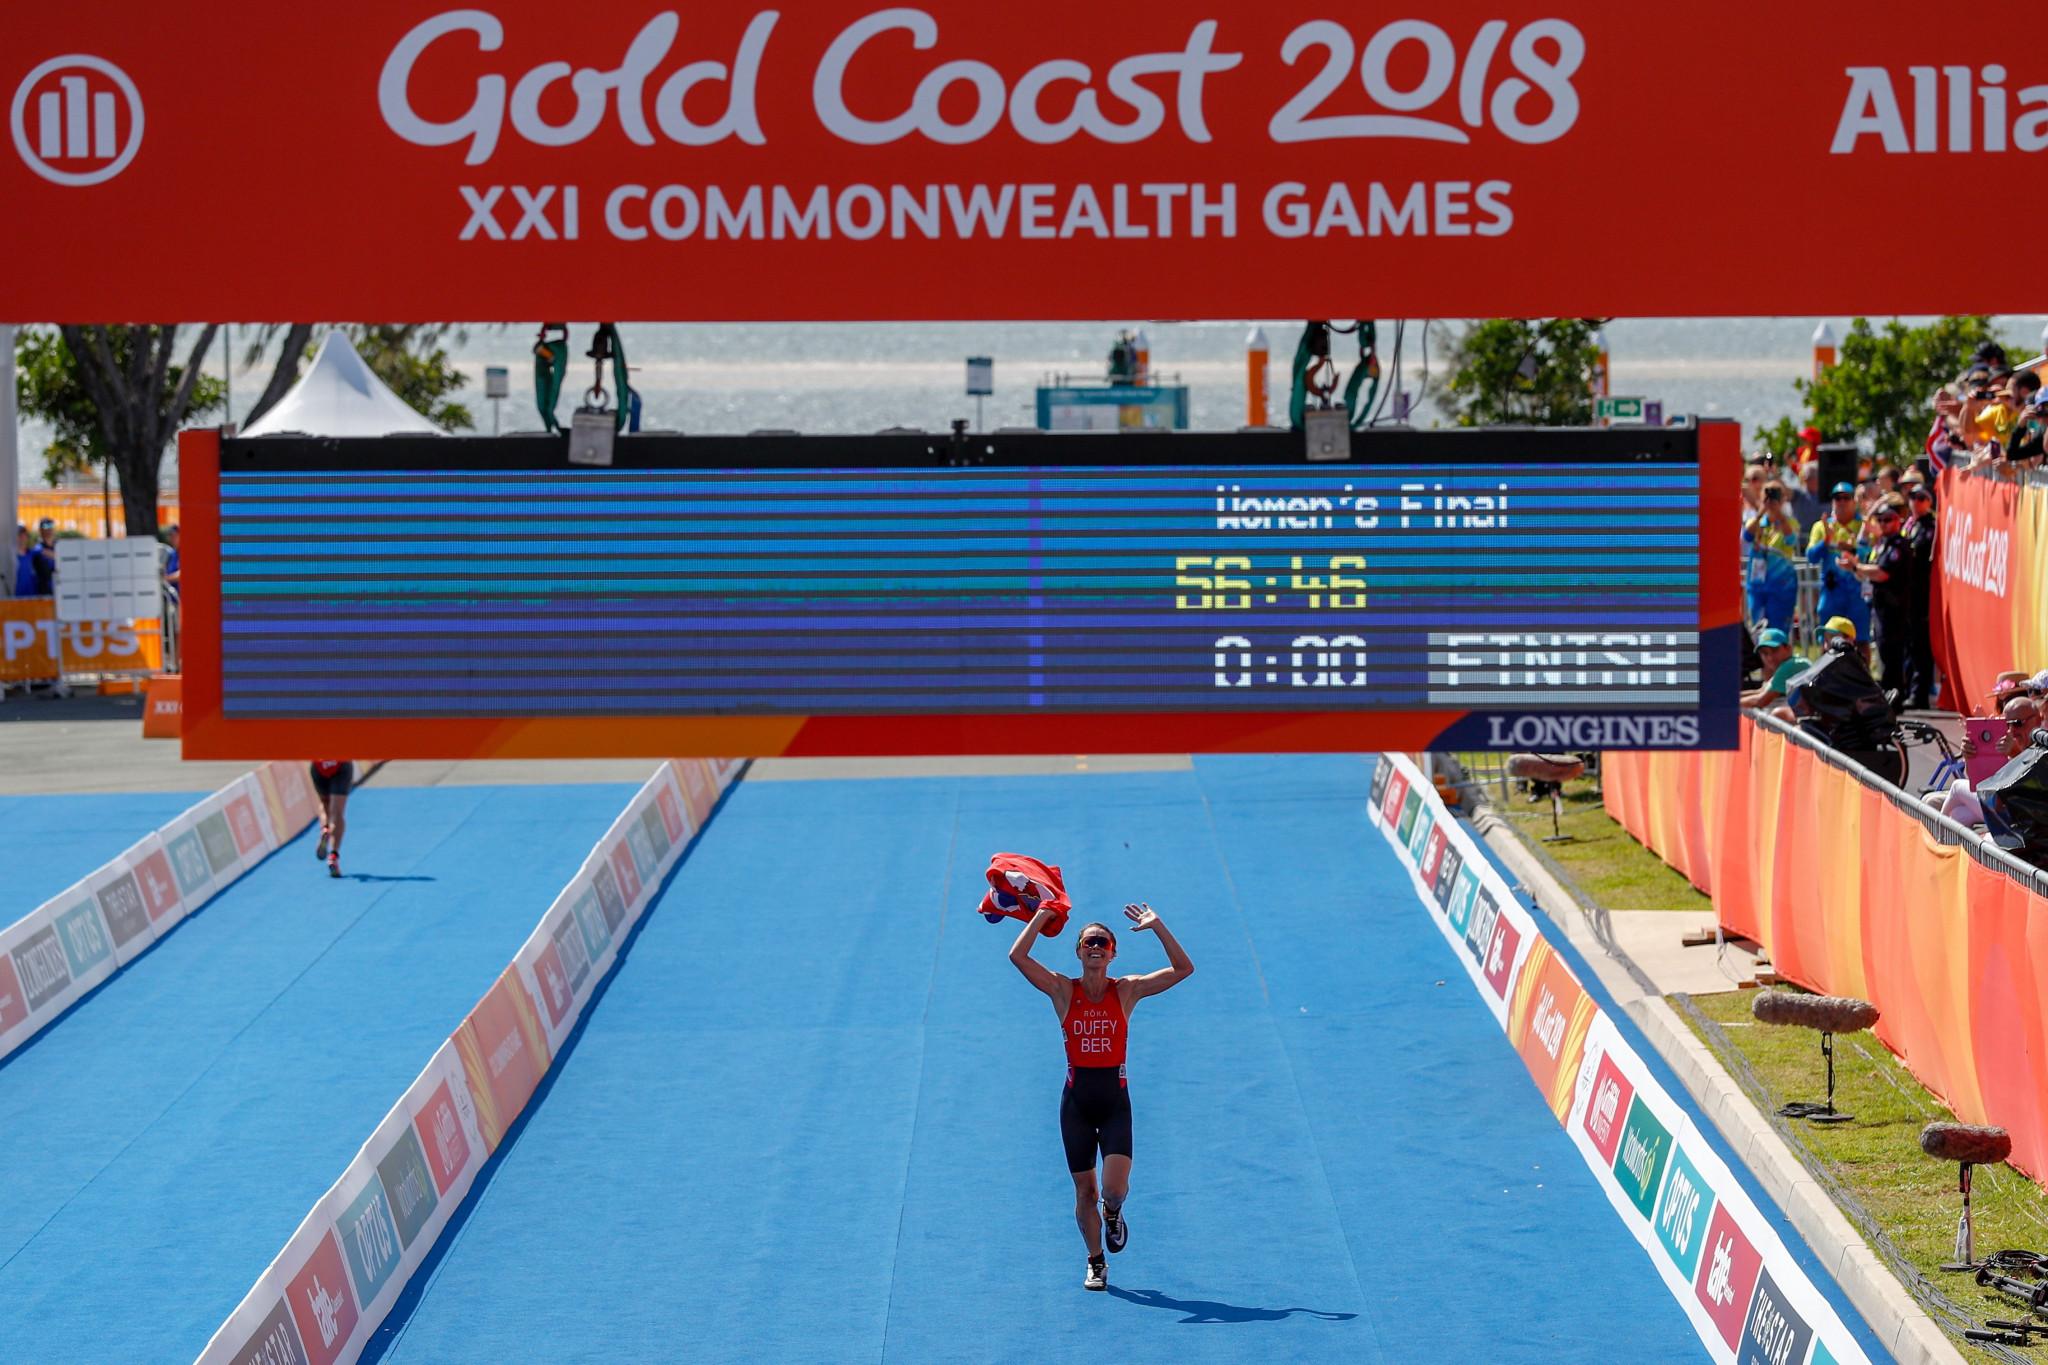 Bermudan triathlete Duffy wins first gold medal of Gold Coast 2018